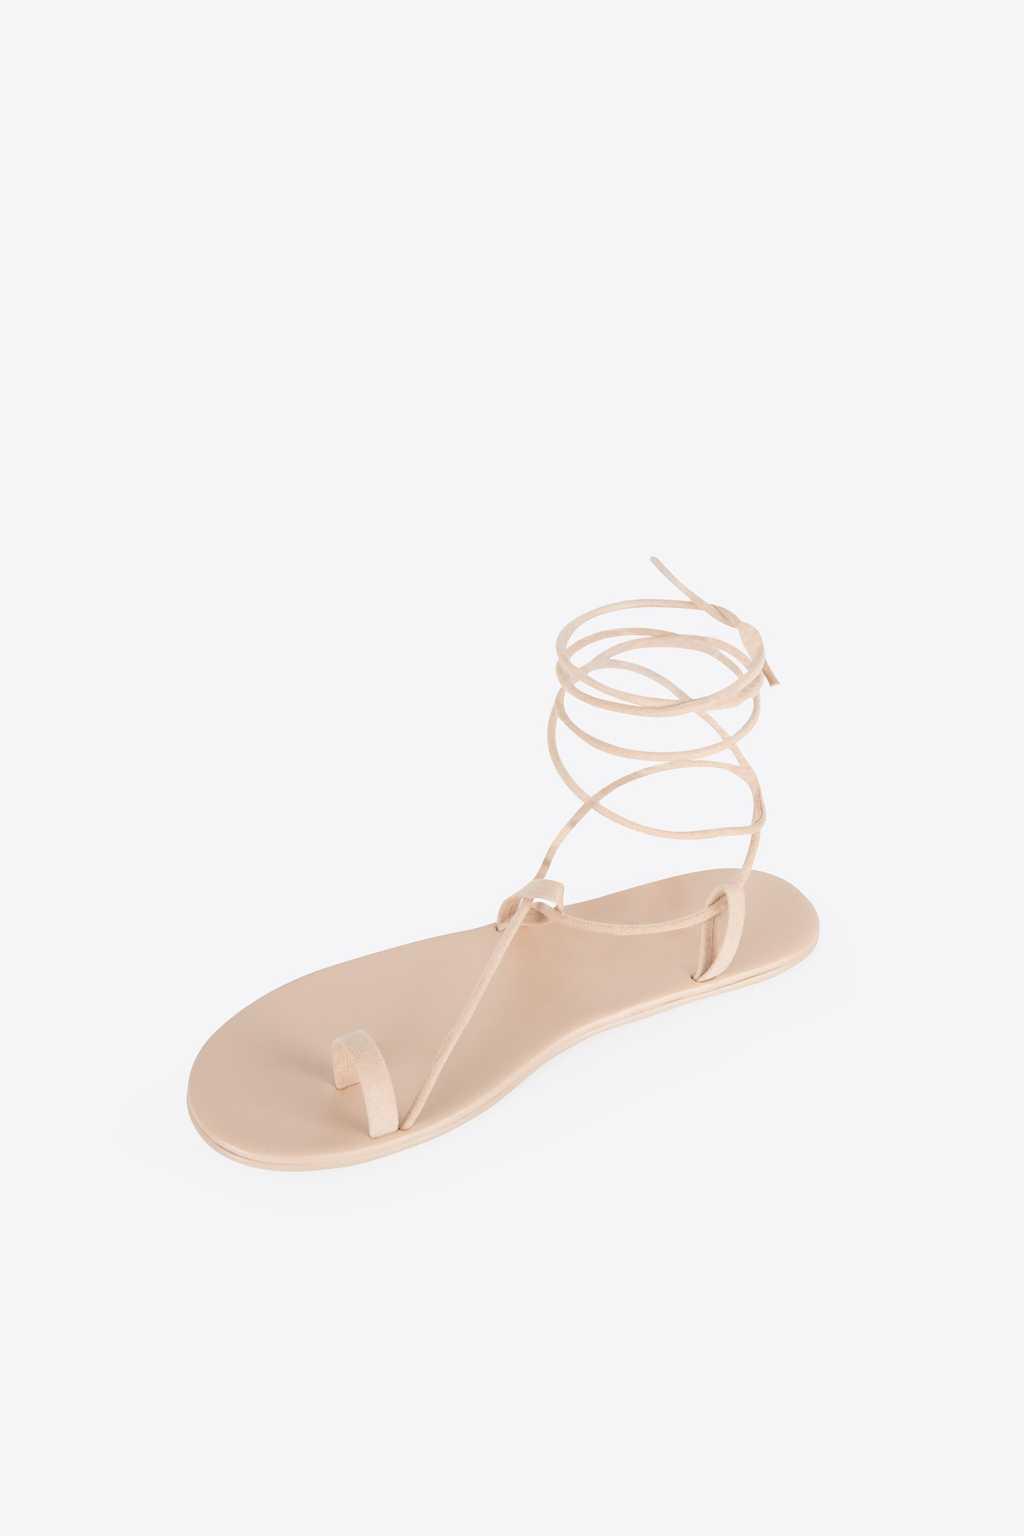 Sandal 1275 Beige 4